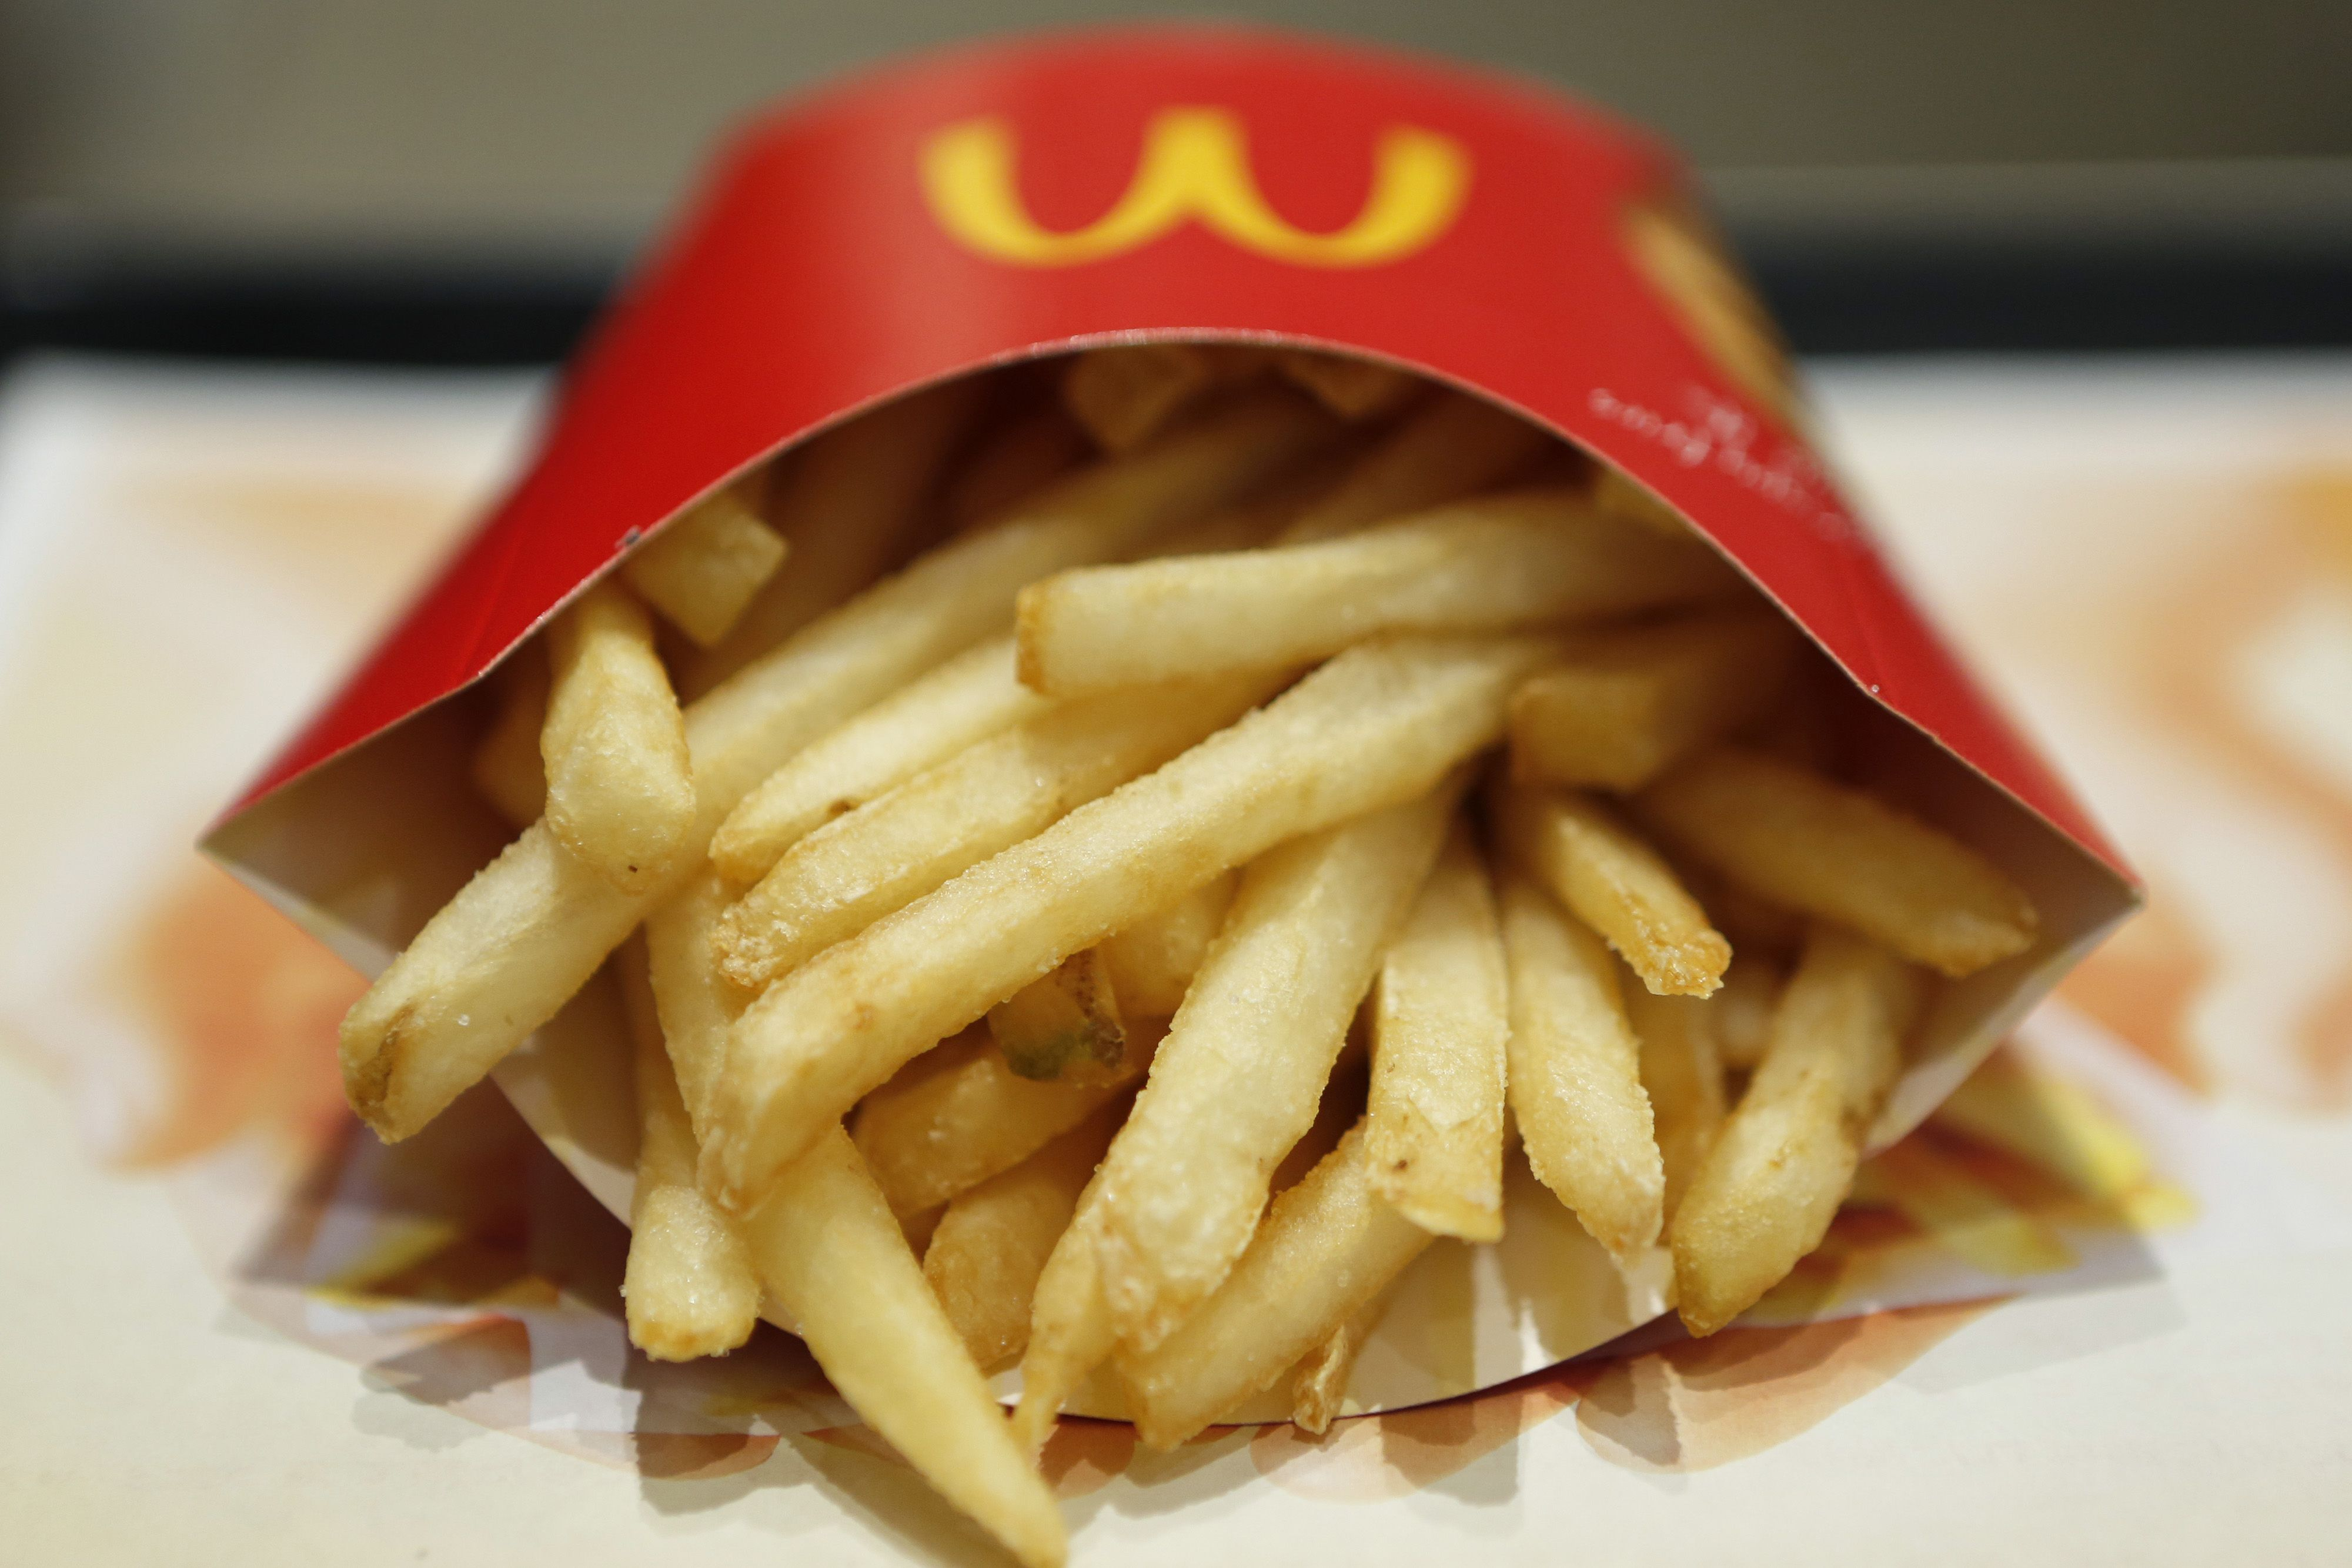 McDonalds Fries Have 18 Ingredients Besides Potatoes